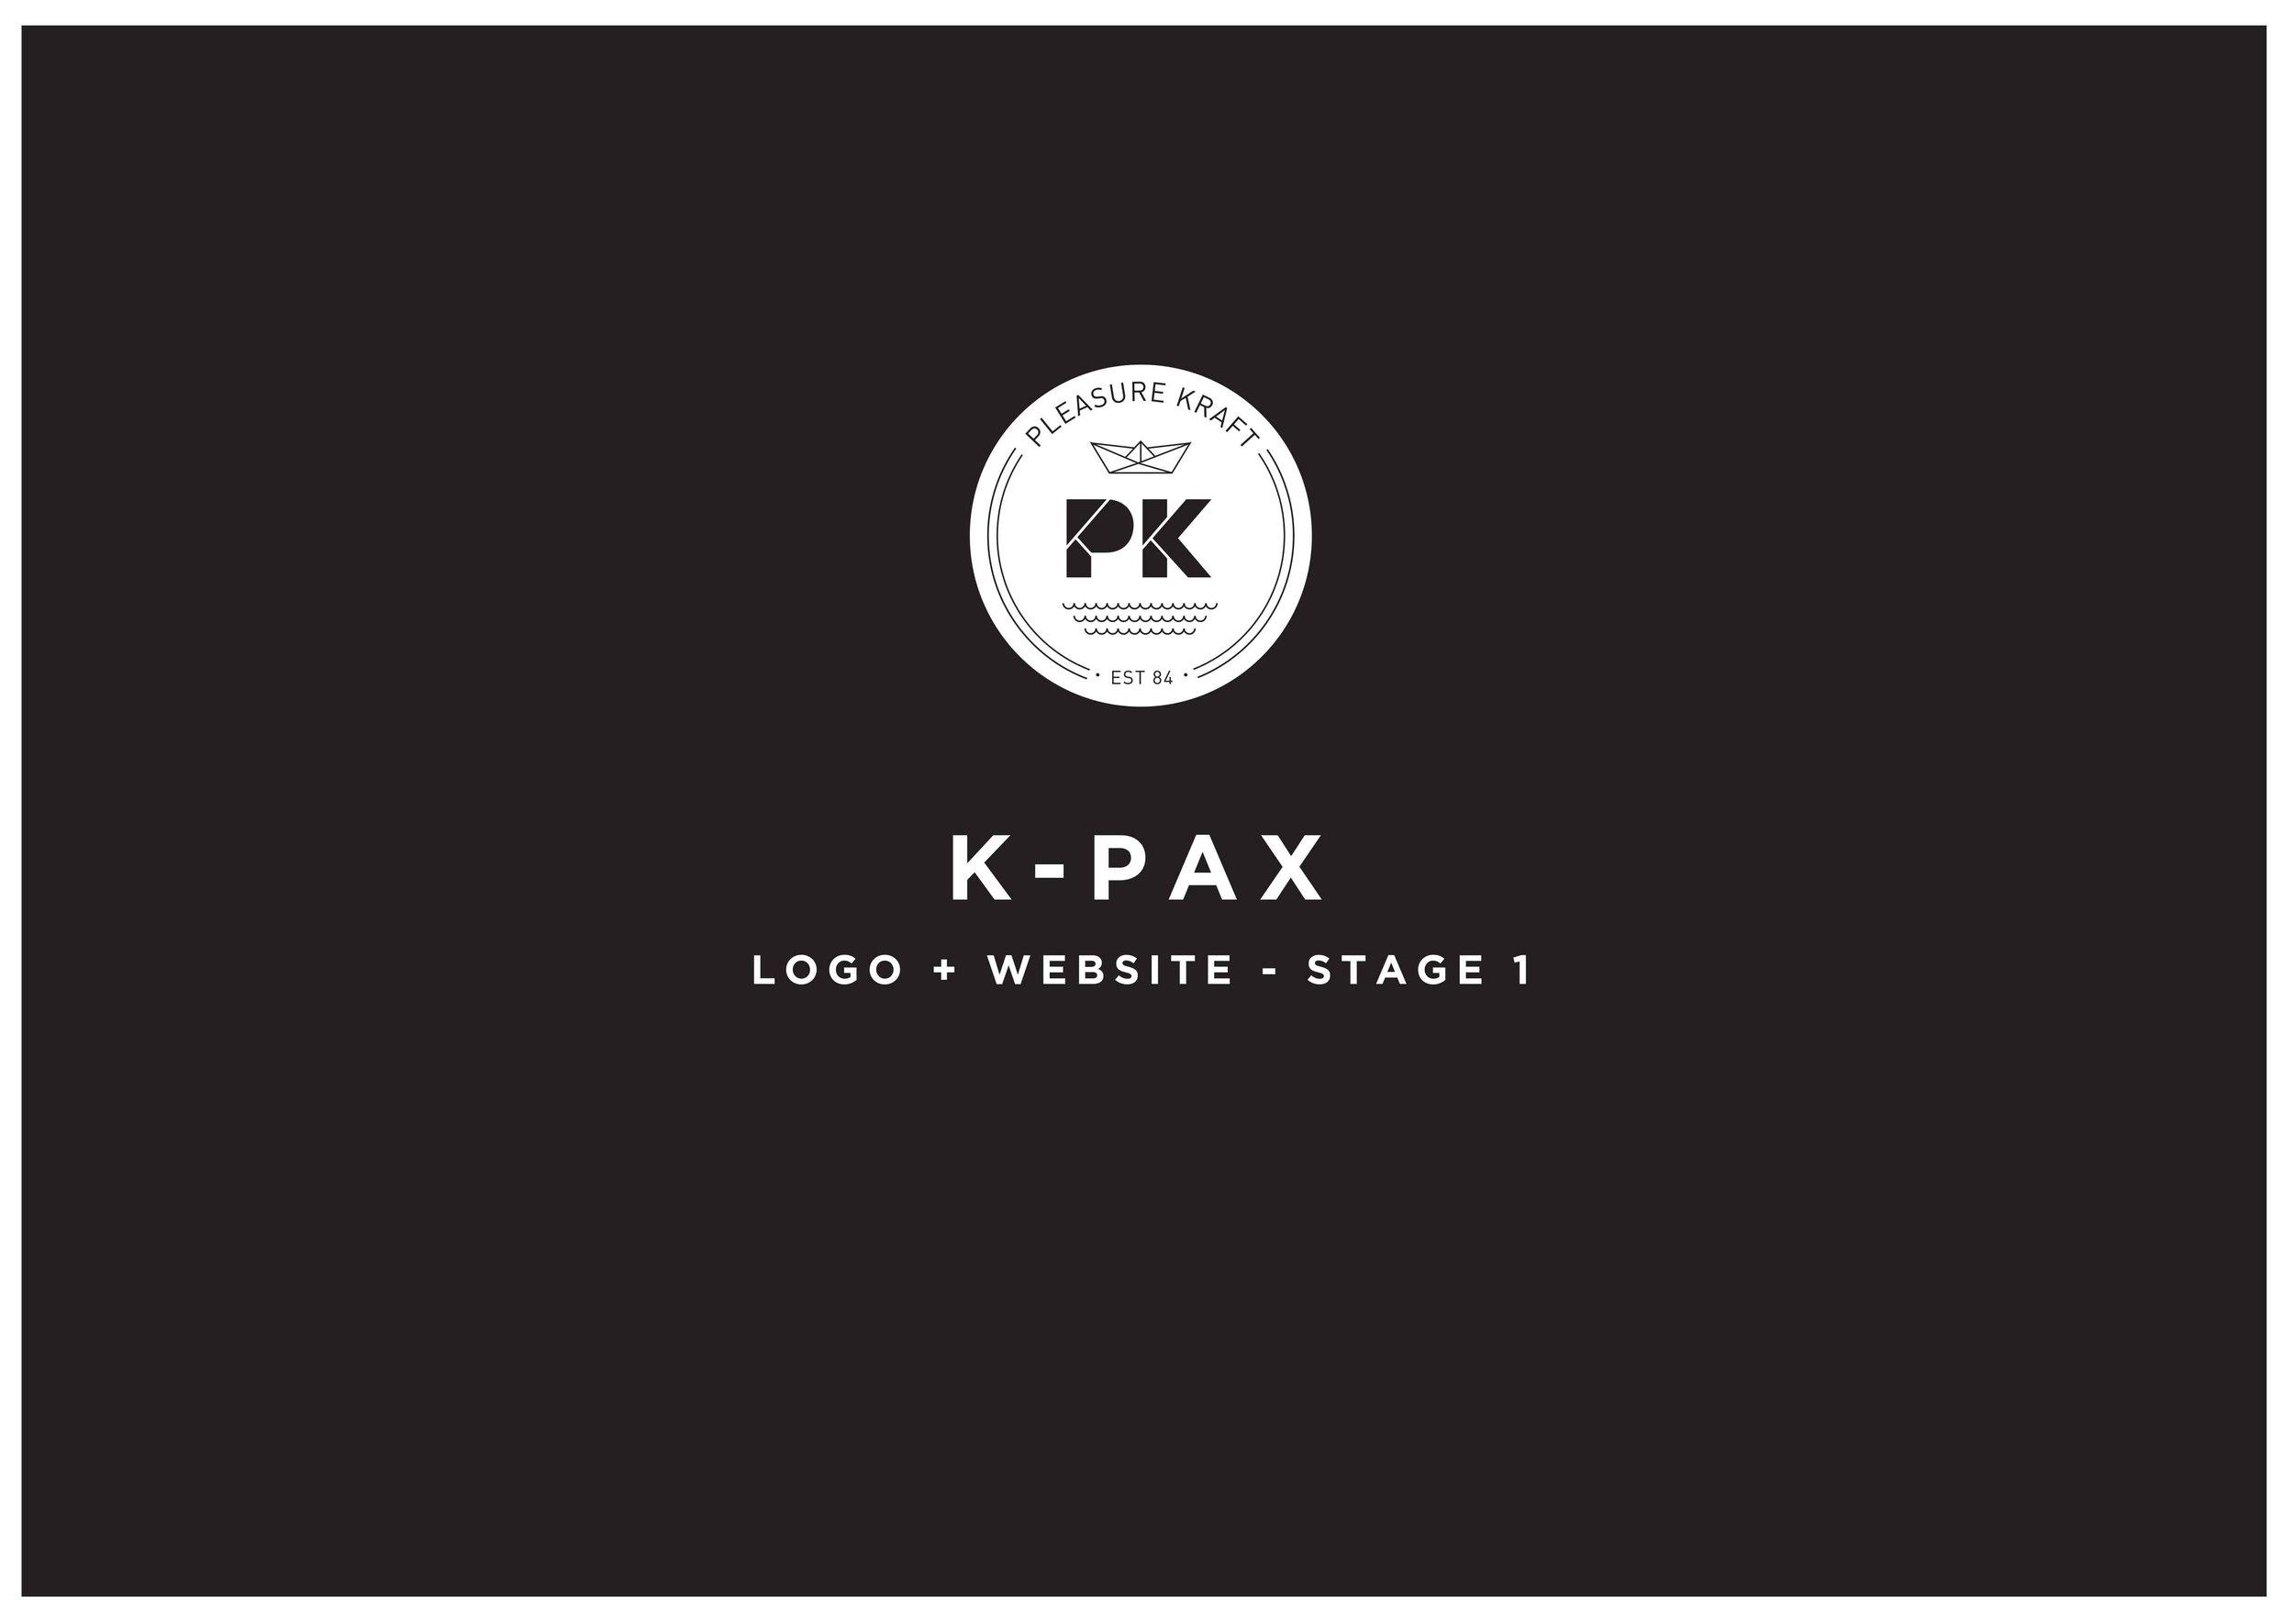 KPAX LOGO+GRAPHIC CONCEPTS PRES-1.jpg